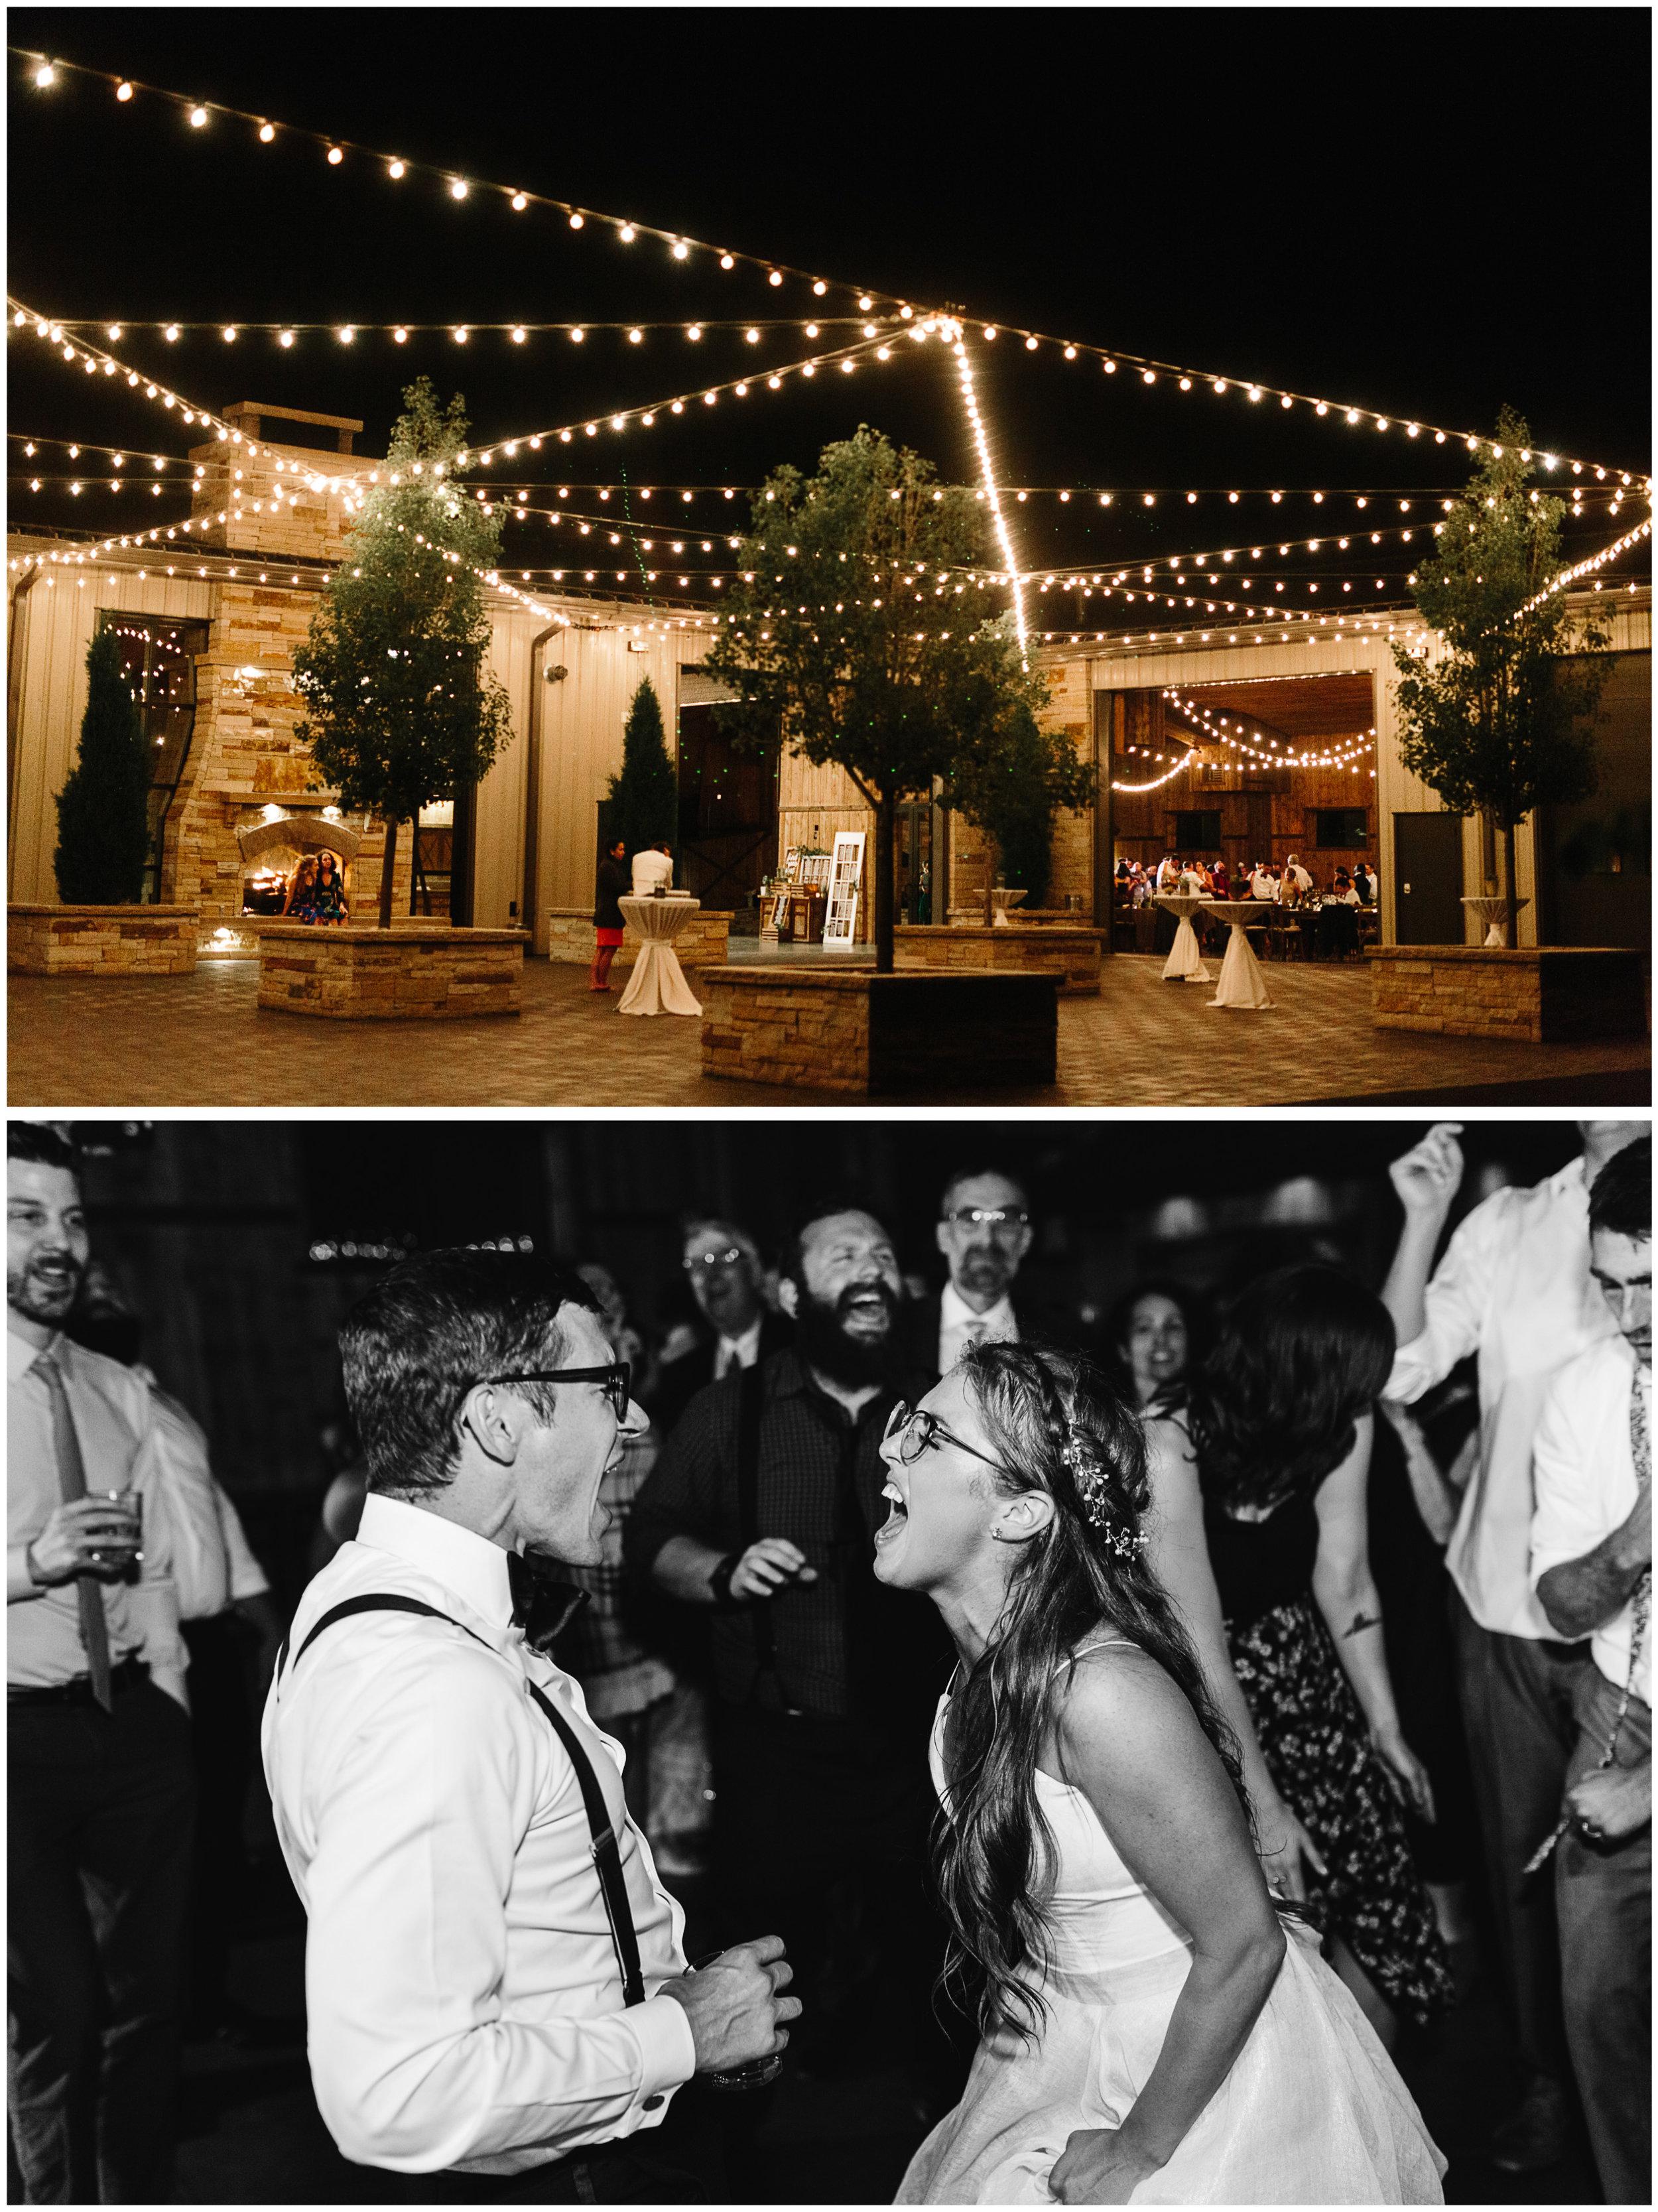 spruce_mountain_ranch_wedding_94.jpg